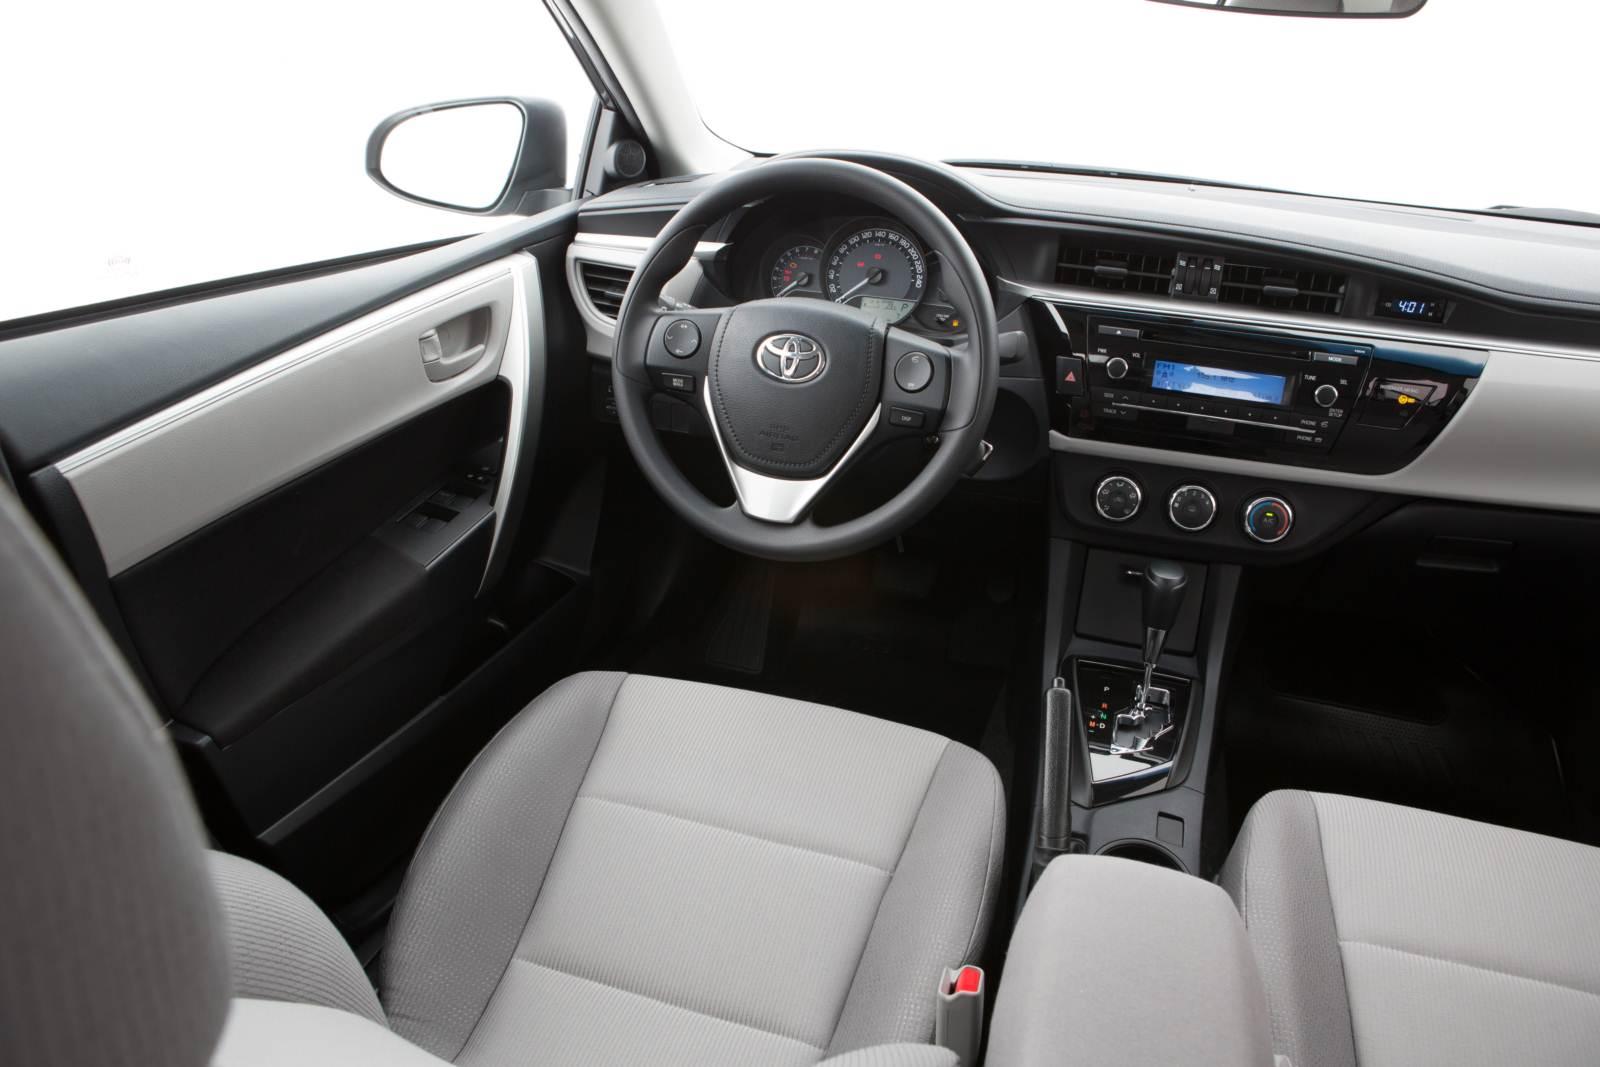 Toyota Corolla x Volkswagen Jetta 2016 - Preços